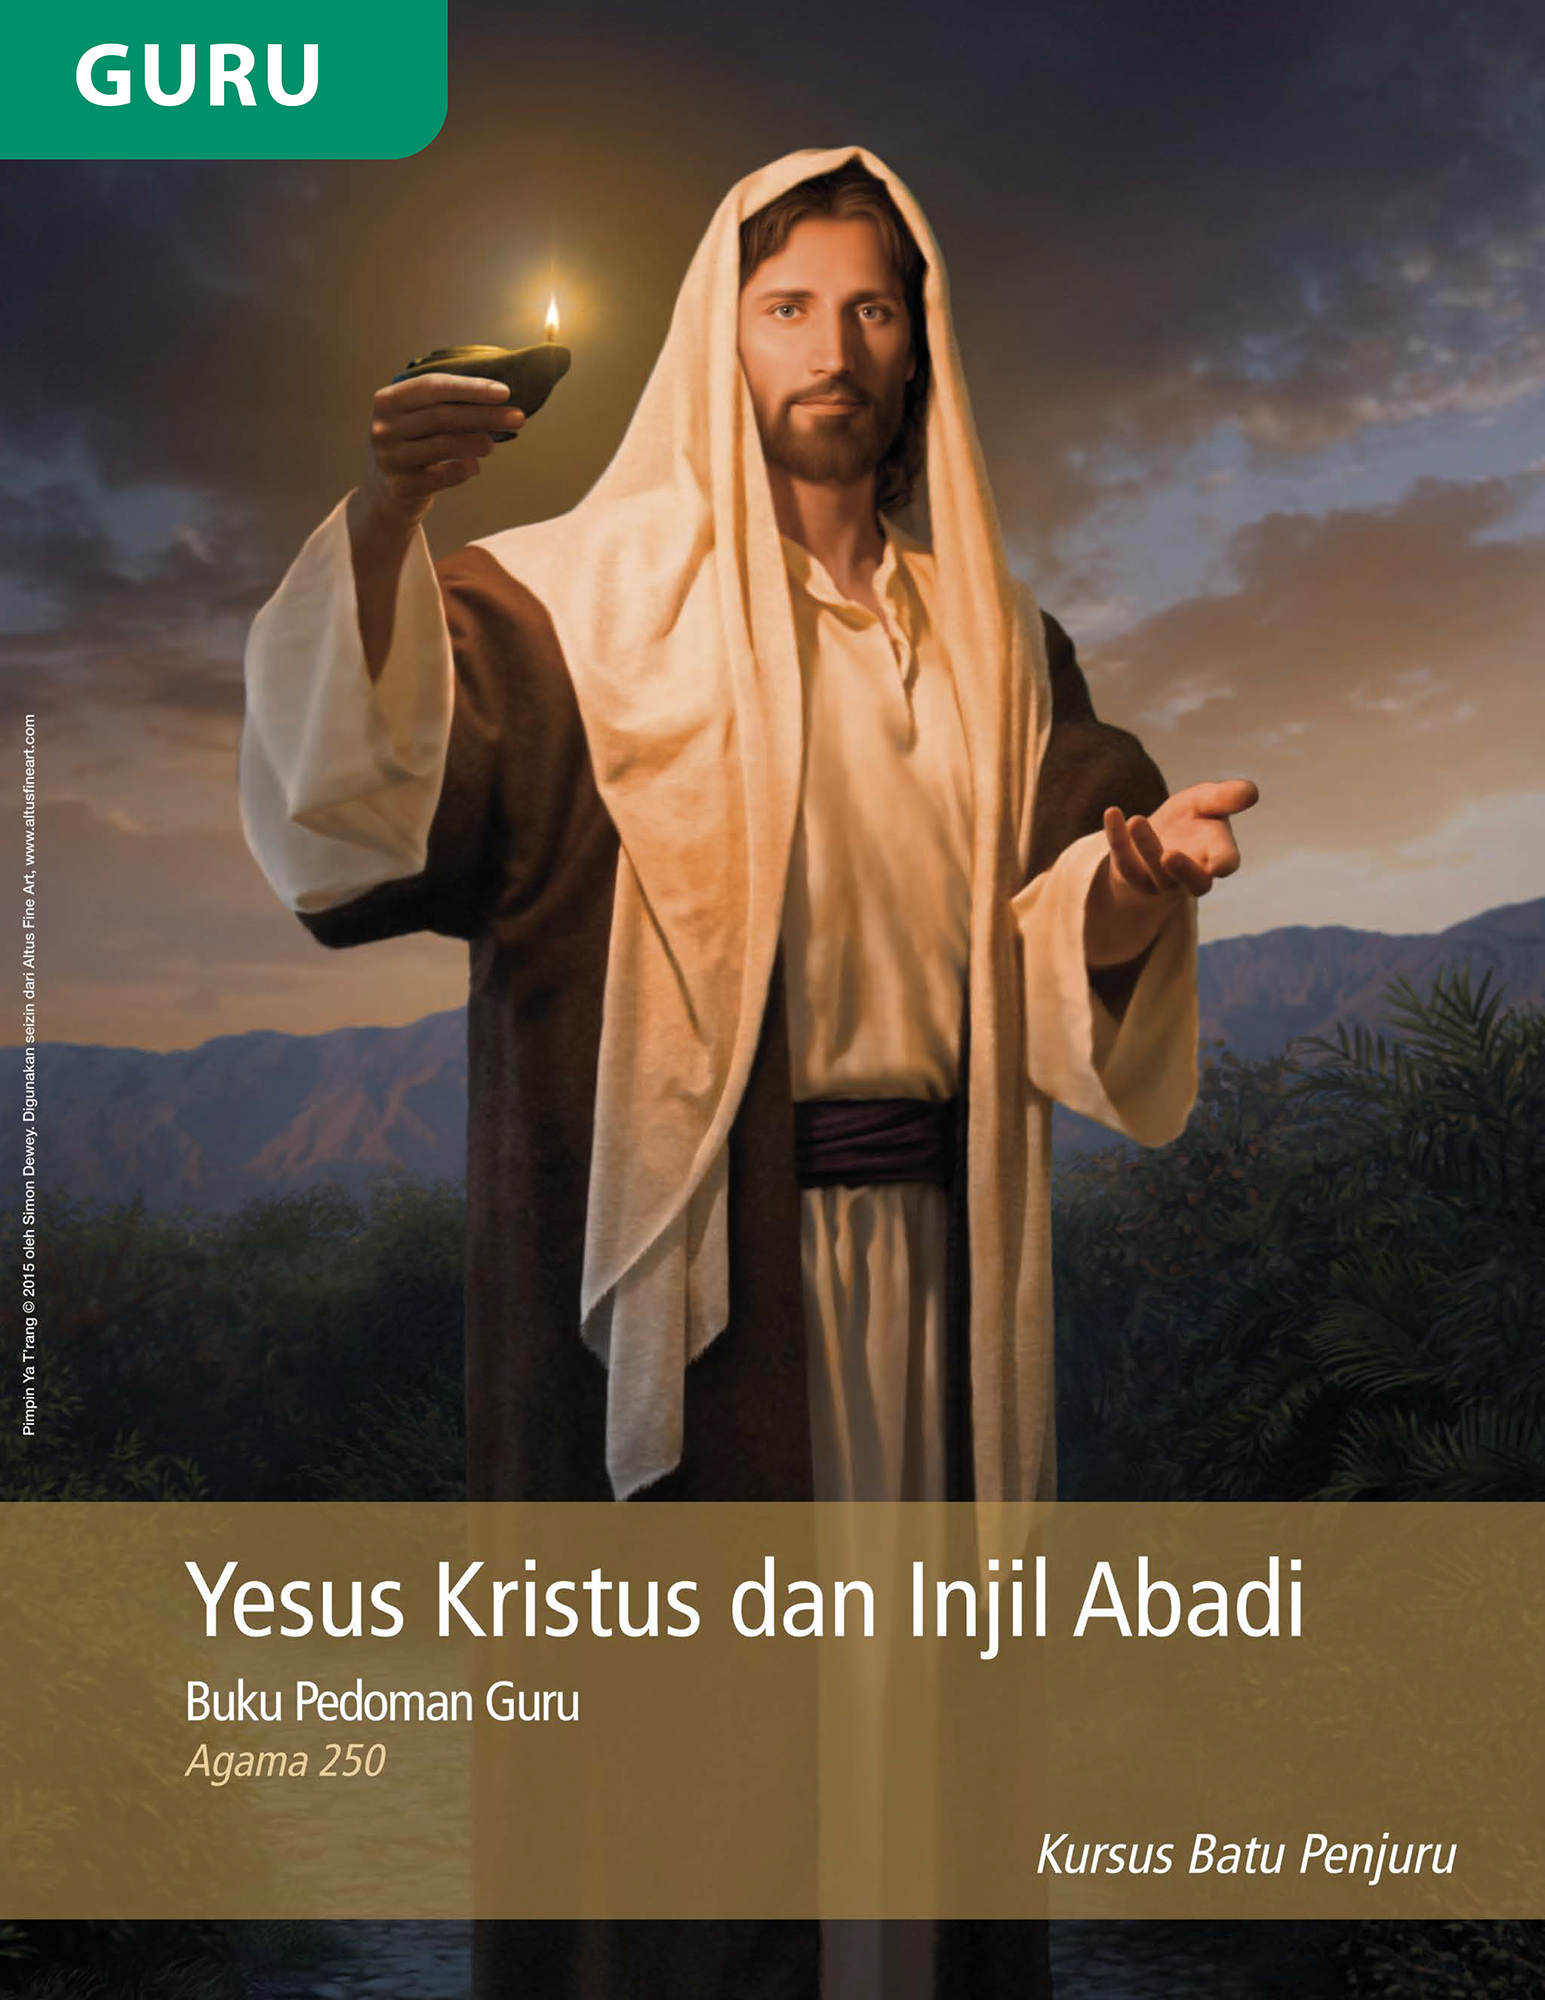 Buku Pedoman Guru Yesus Kristus dan Injil Abadi (Religi 250)